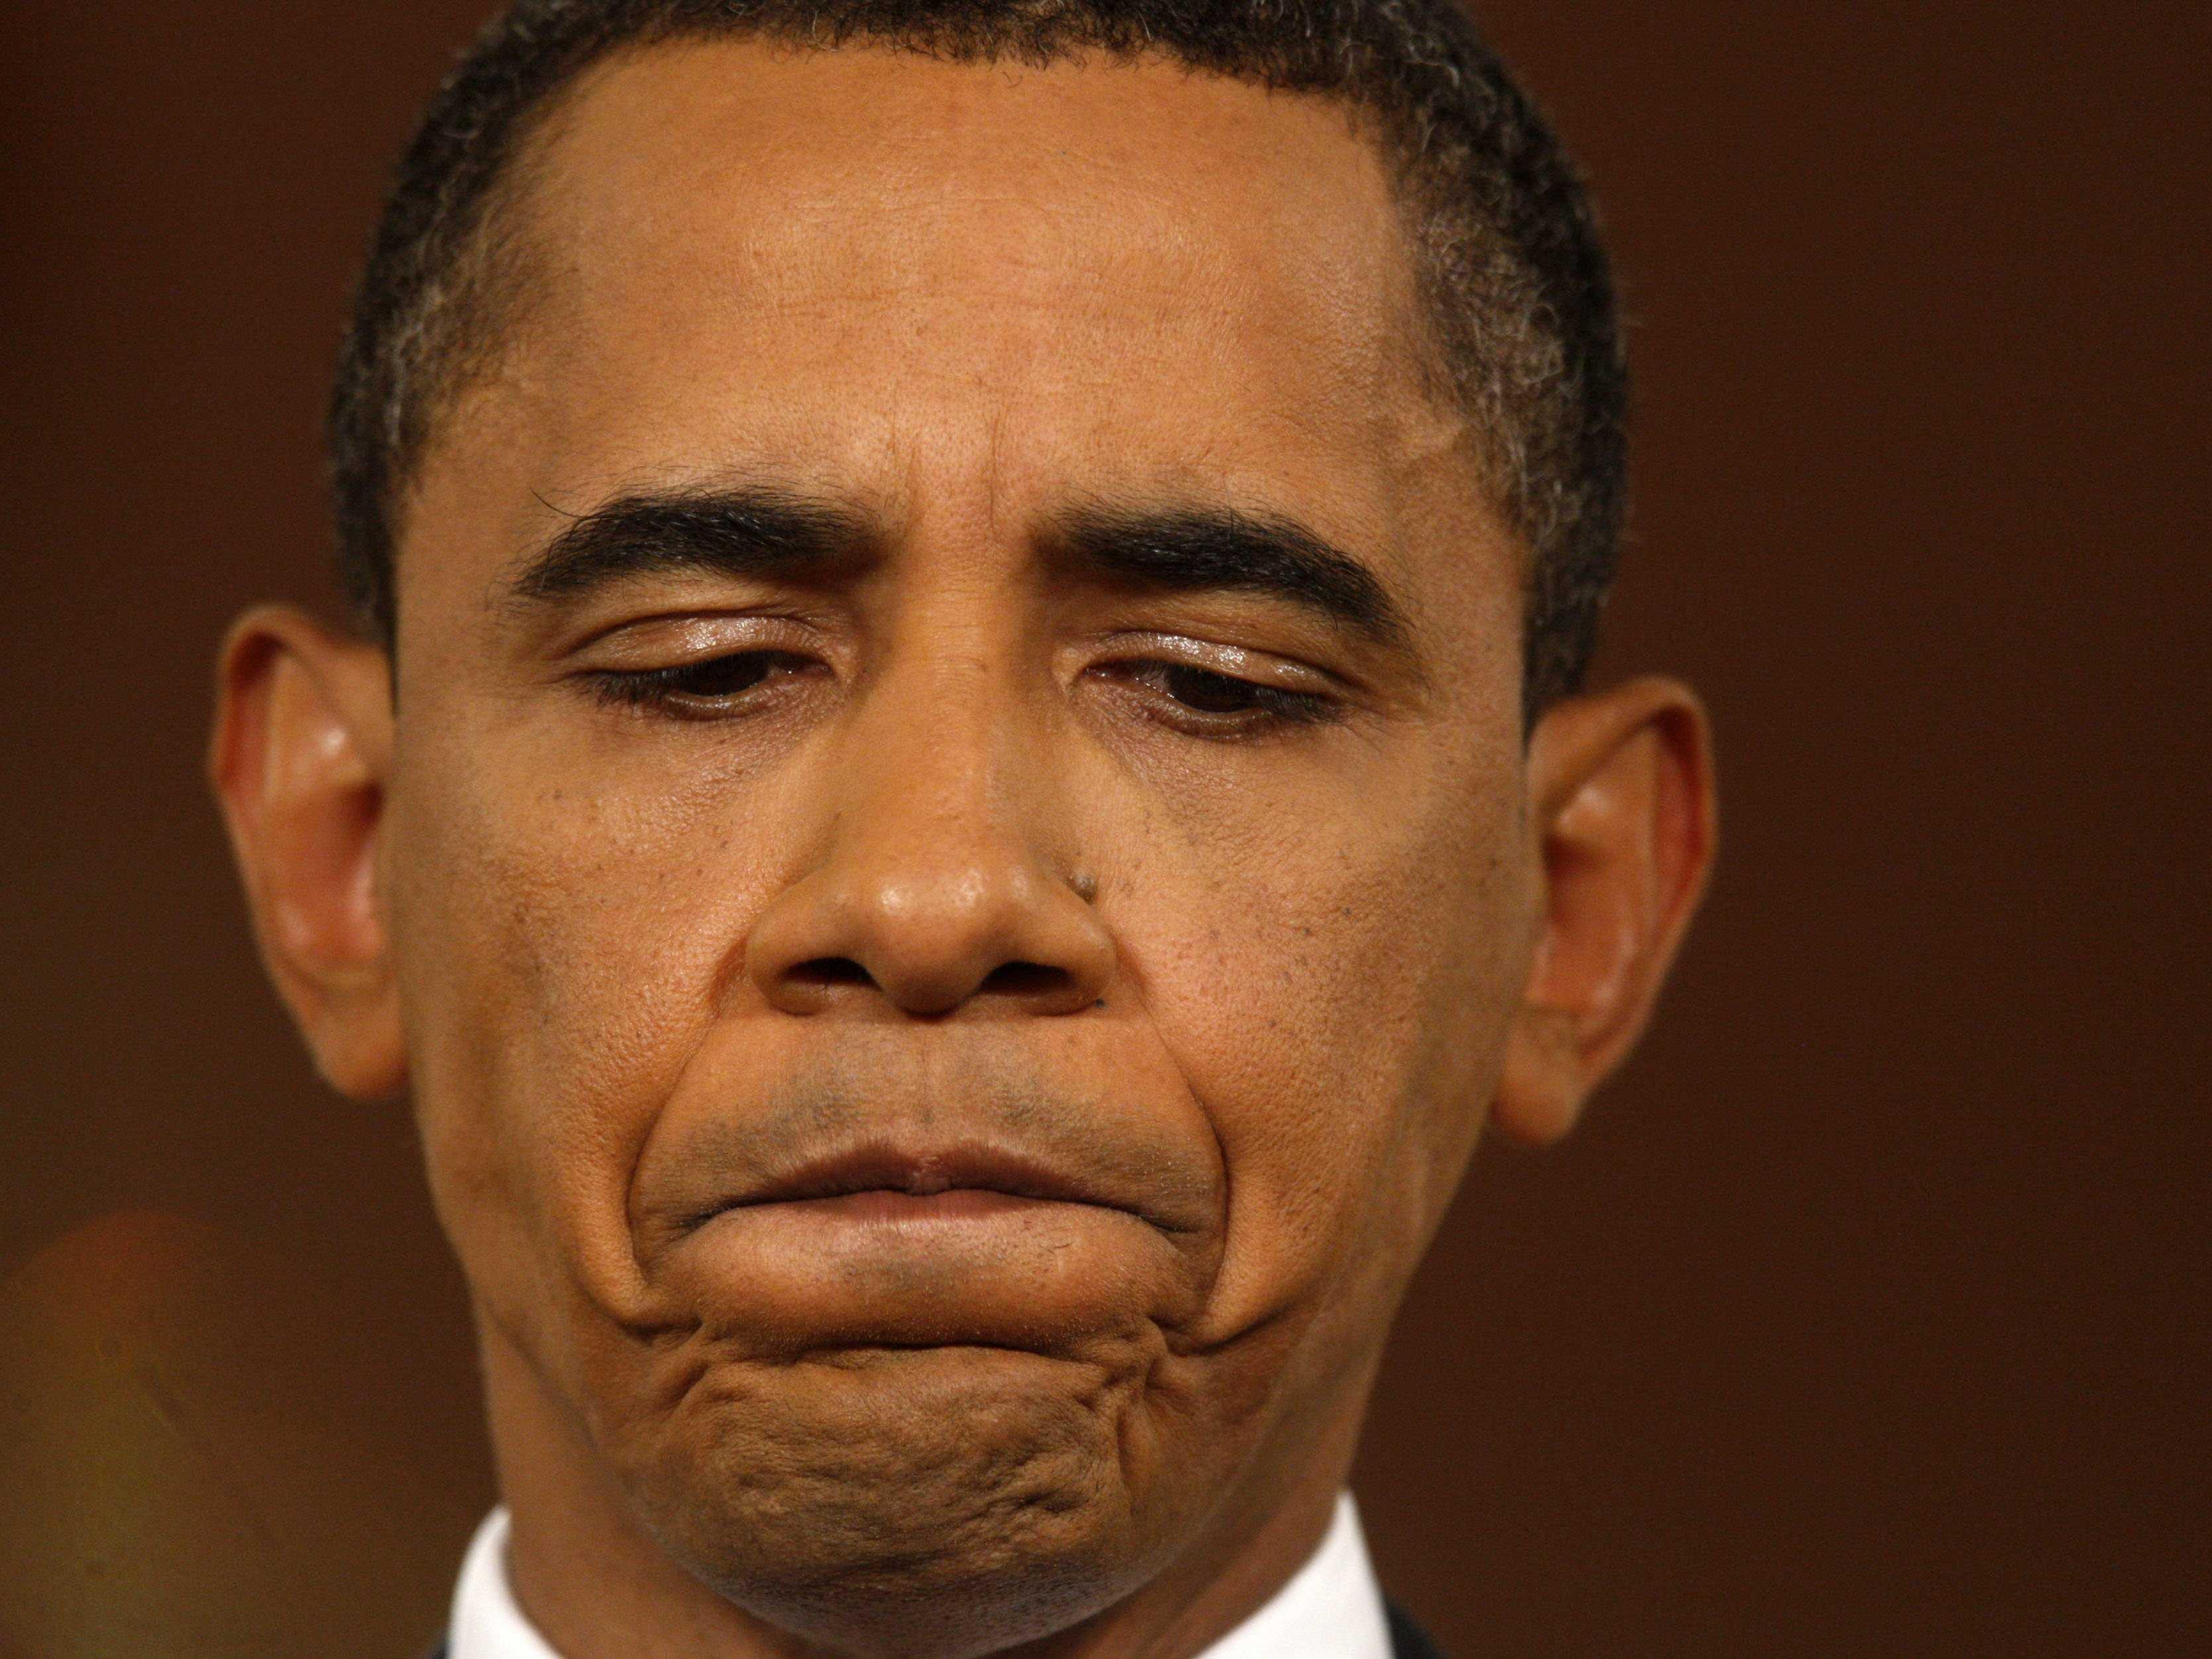 Barack Obama cel mai slab presedinte al SUA